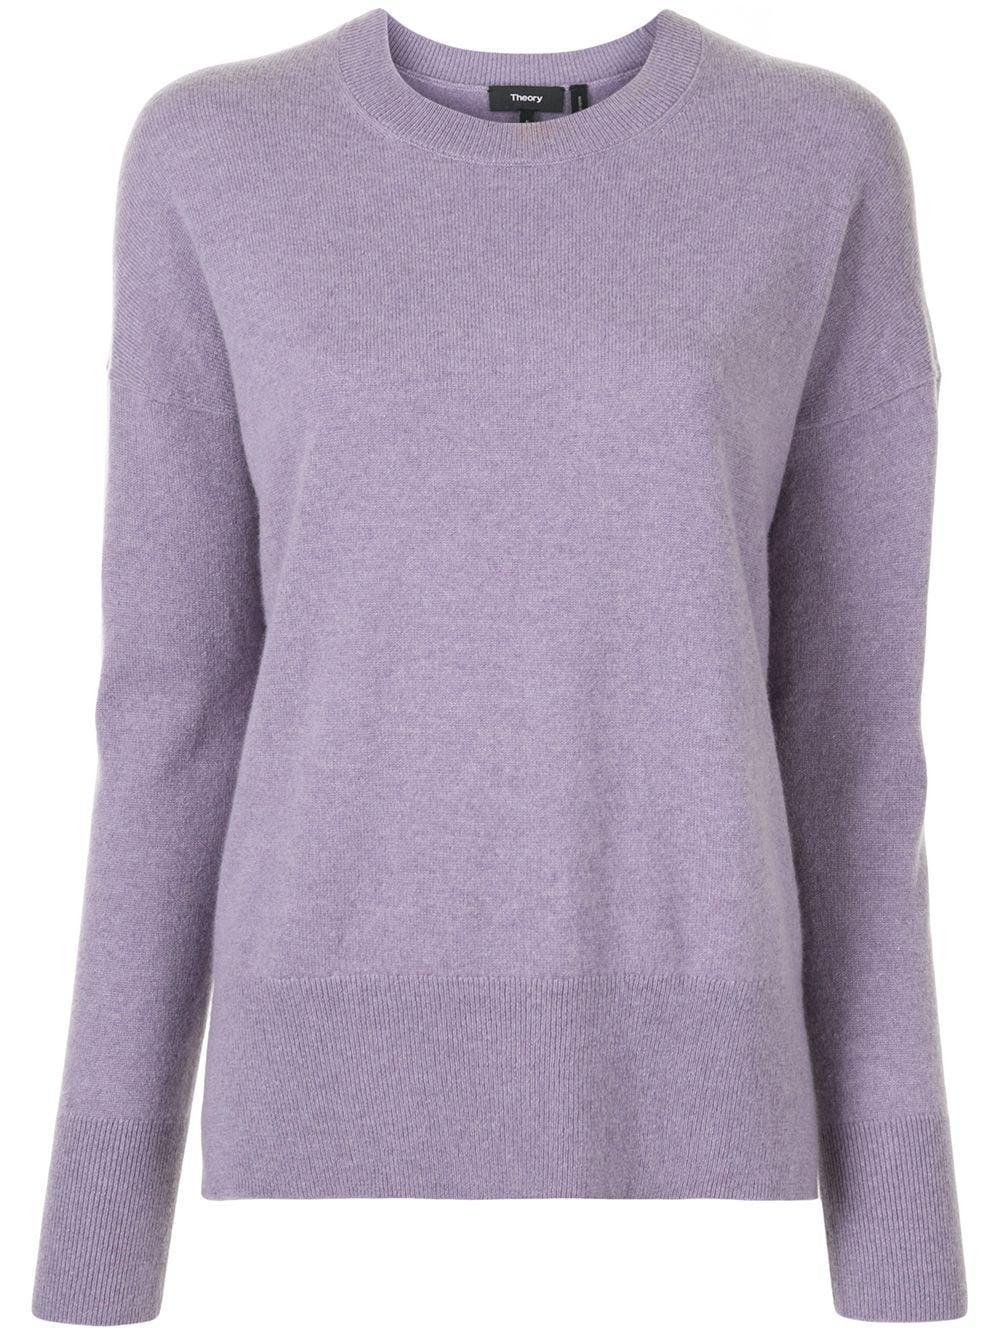 Karenia Cashmere Sweater